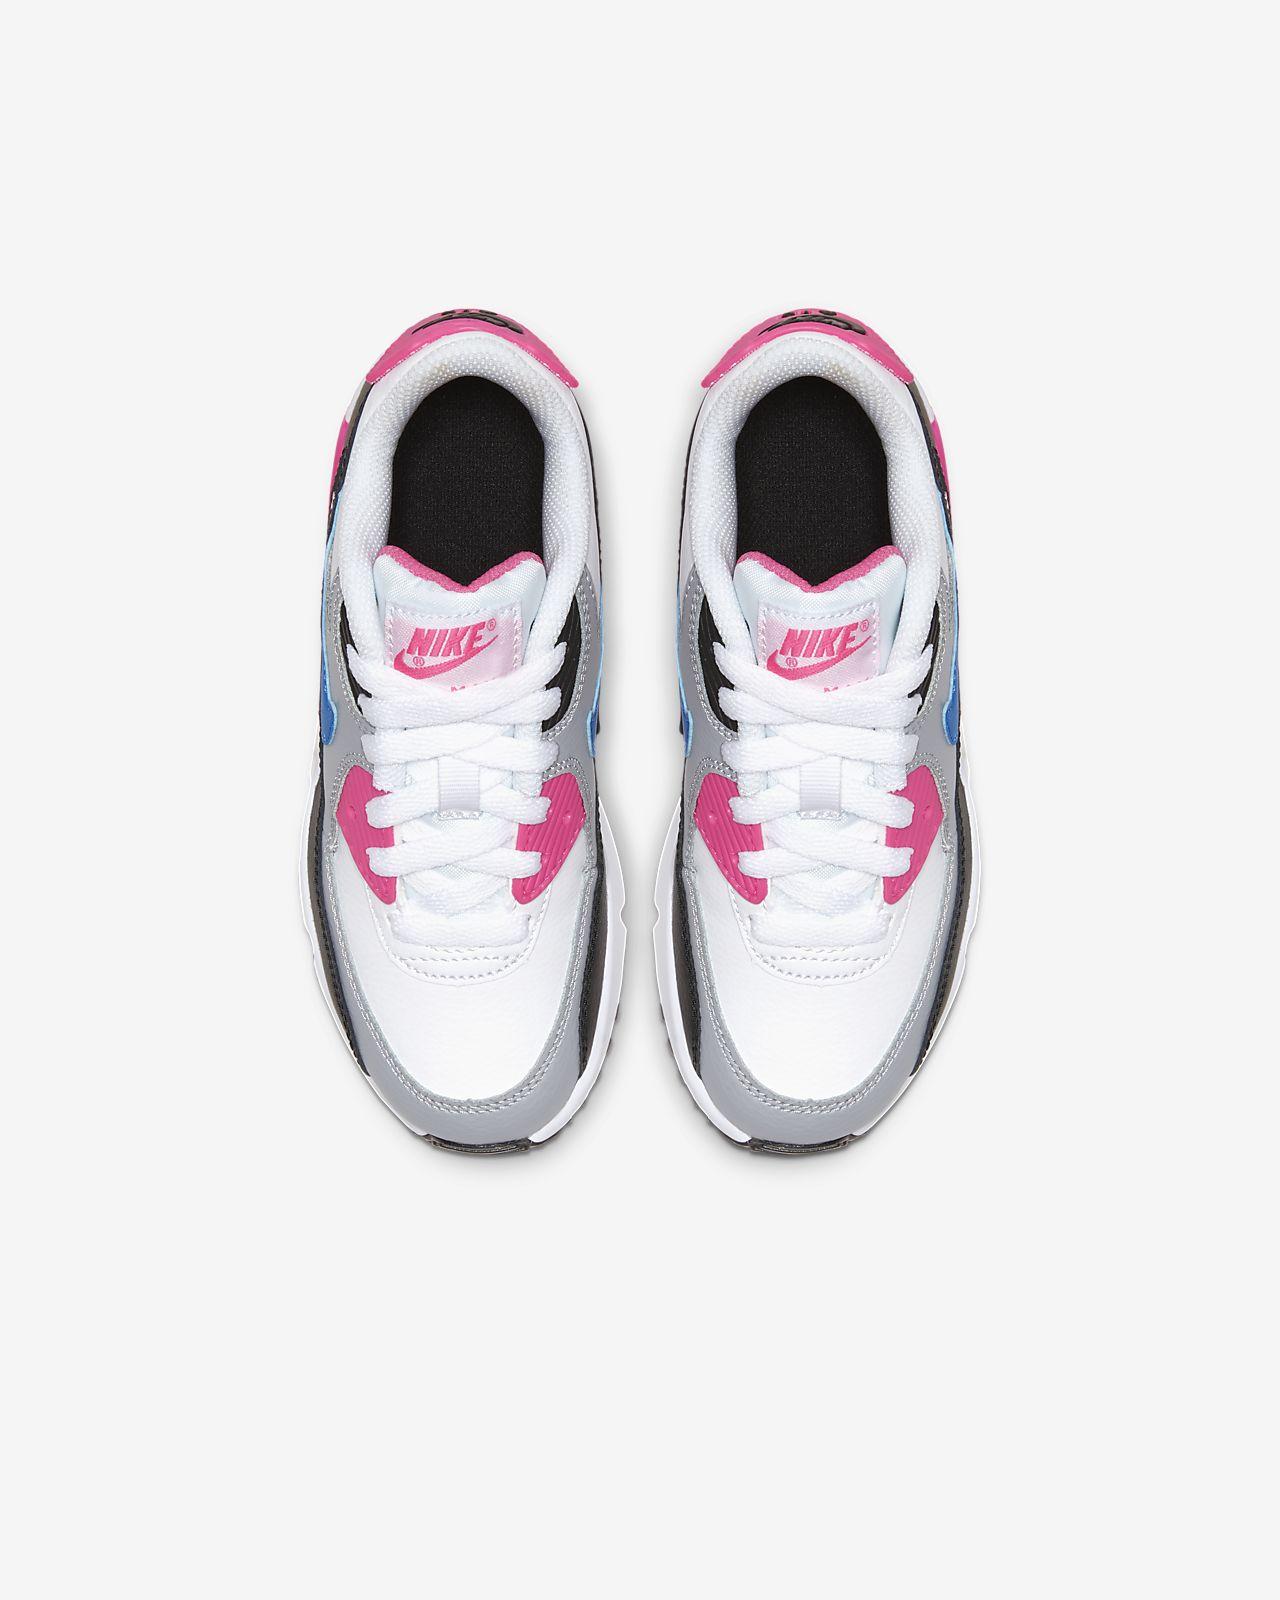 ba6362a7 Nike Air Max 90 Leather Little Kids' Shoe